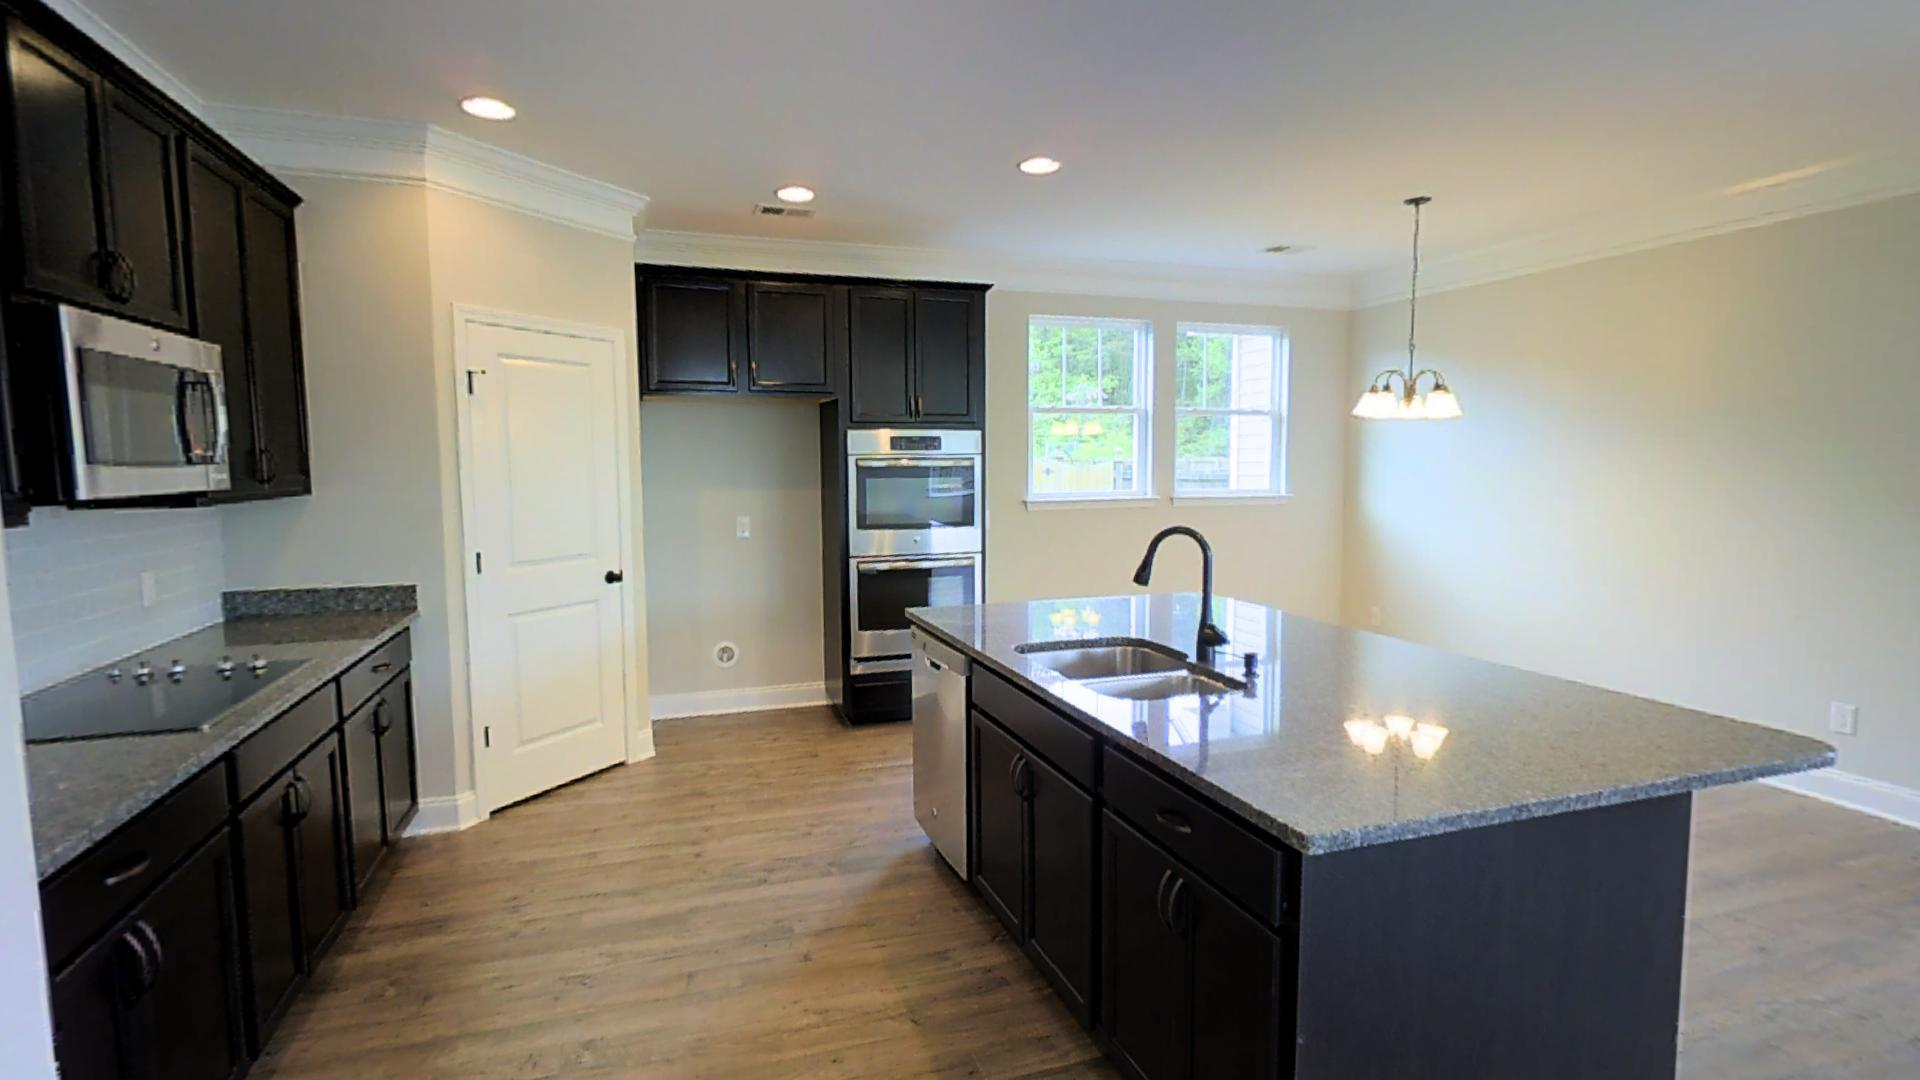 Pinehill Acres Homes For Sale - 129 Schoonover, Summerville, SC - 5